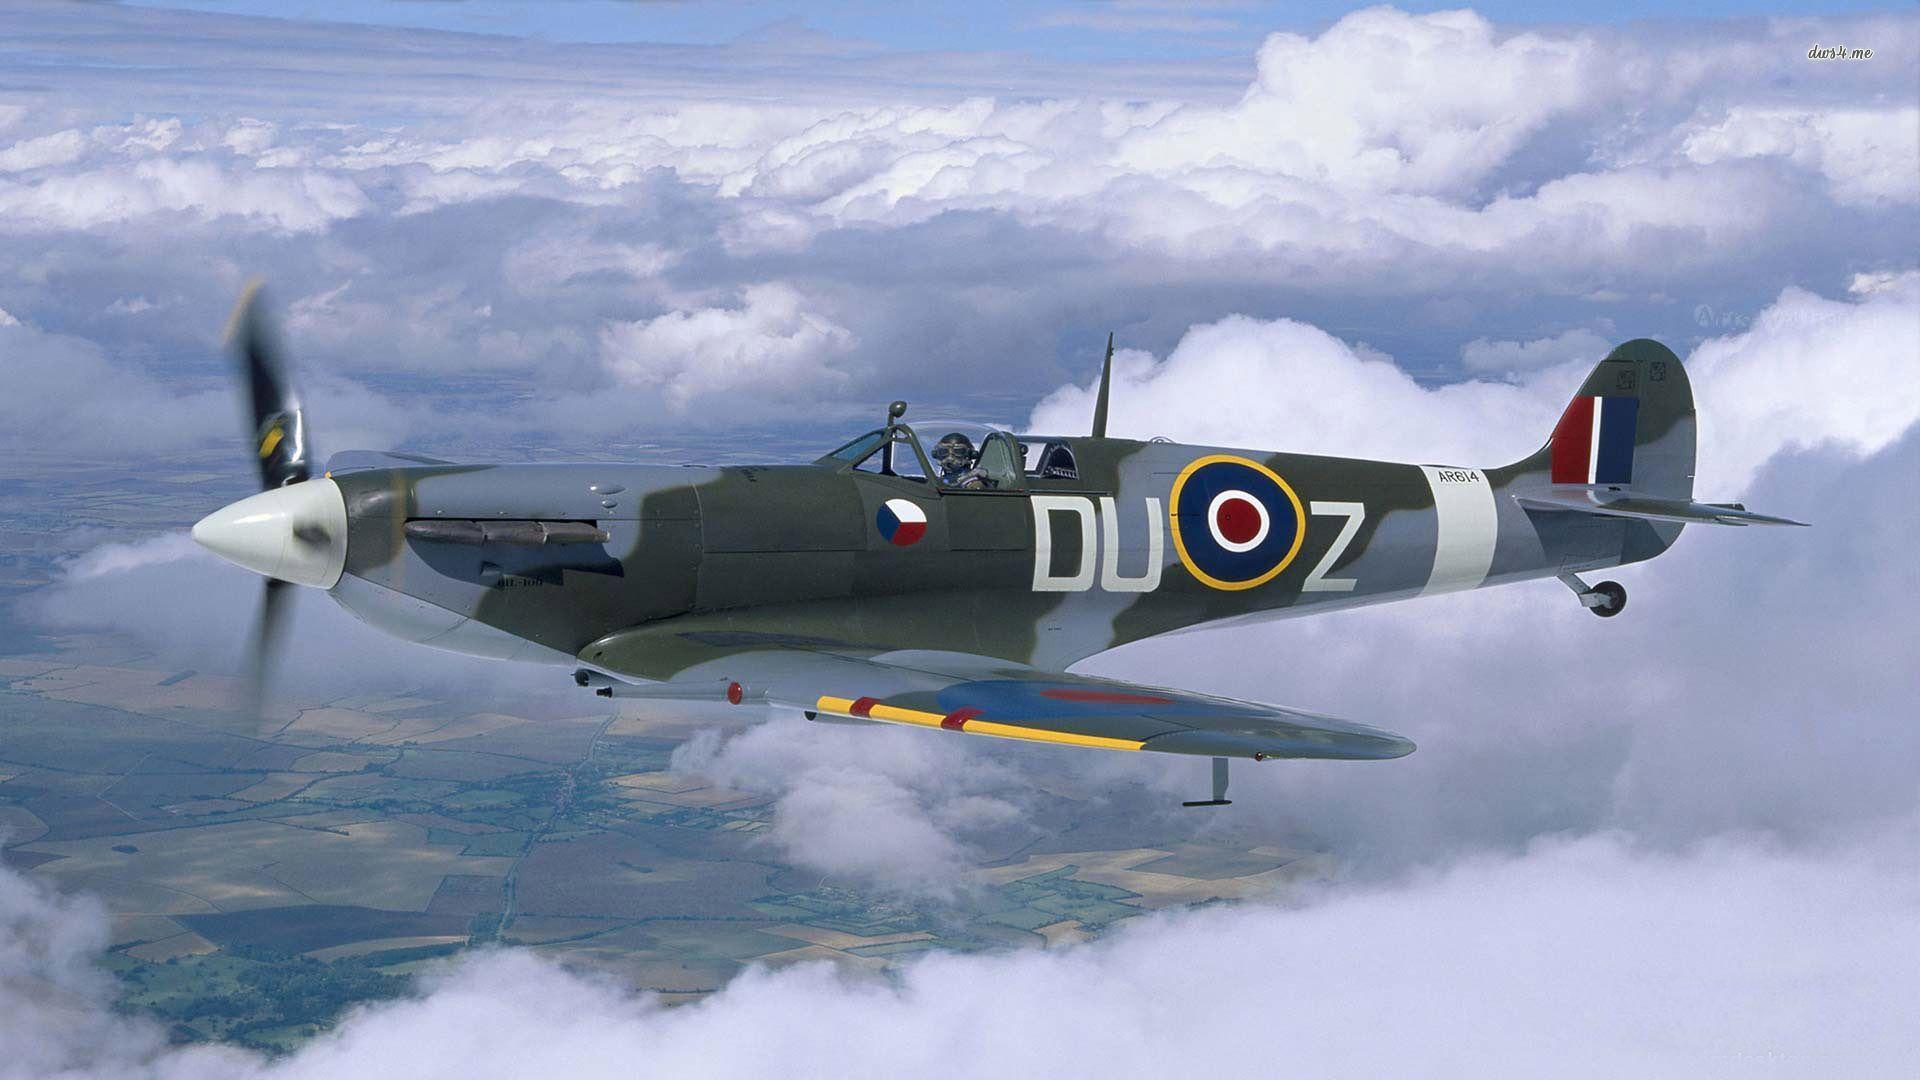 Supermarine Spitfire Wallpapers 1920x1080